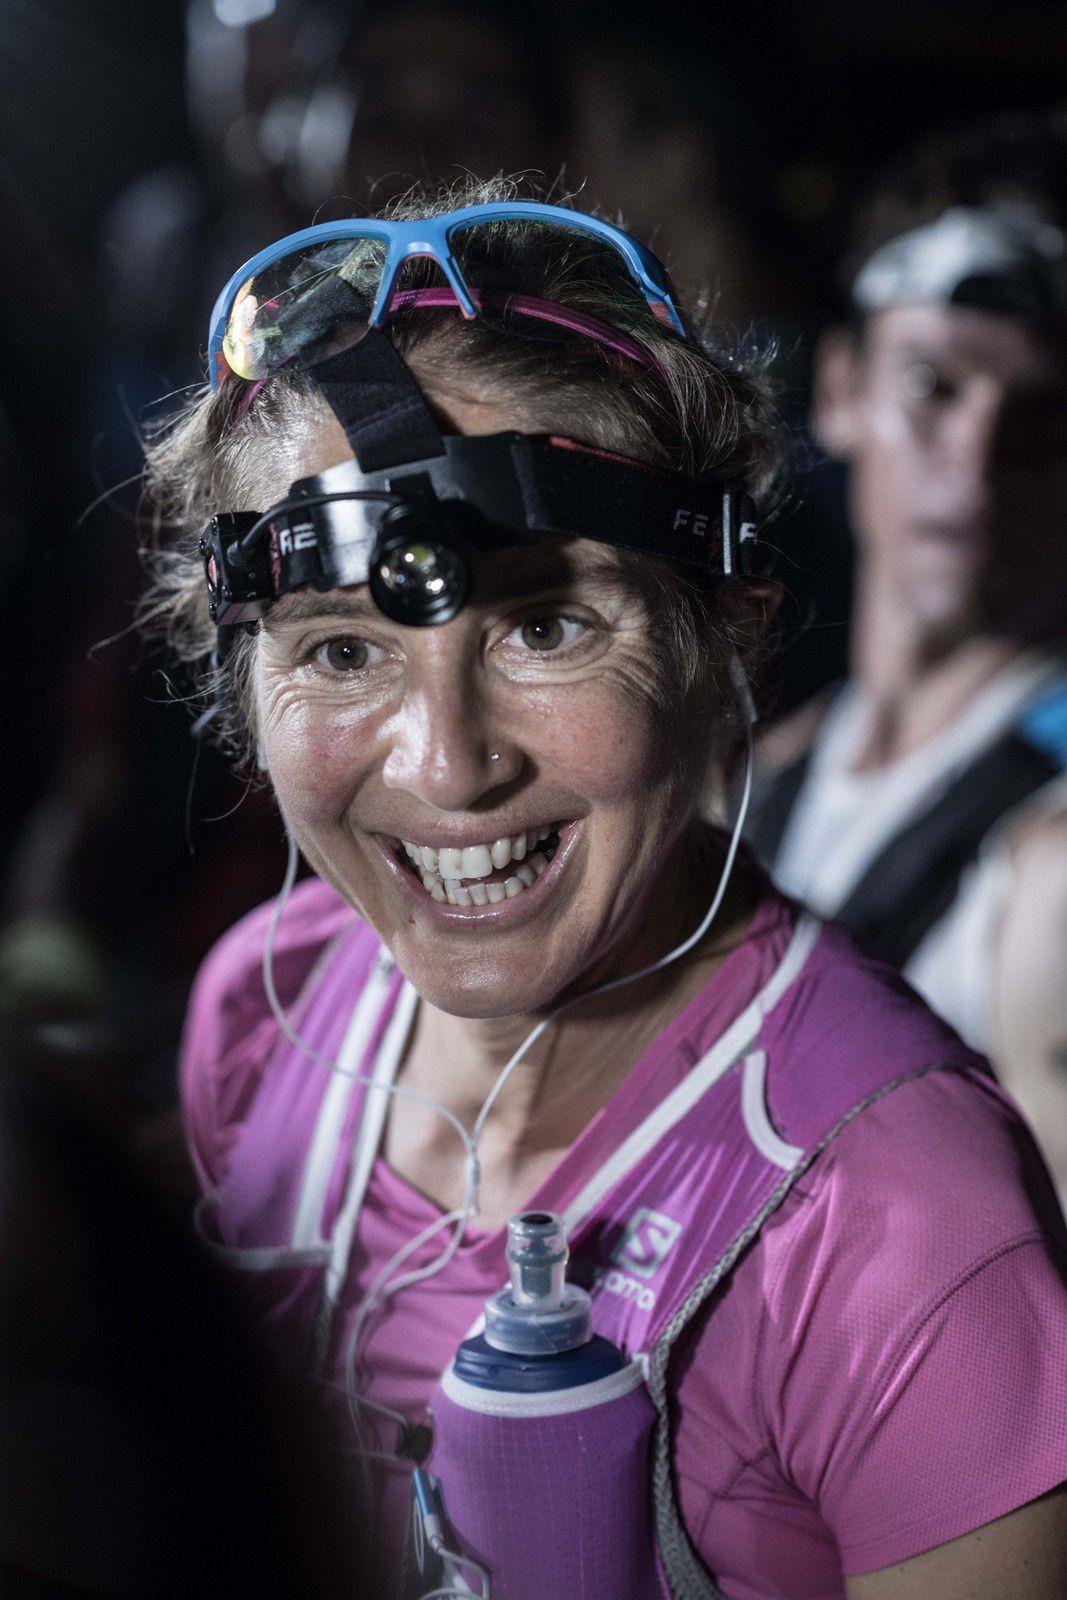 23 juin The North Face Lavaredo Ultra Trail Caroline Chaverot au départ